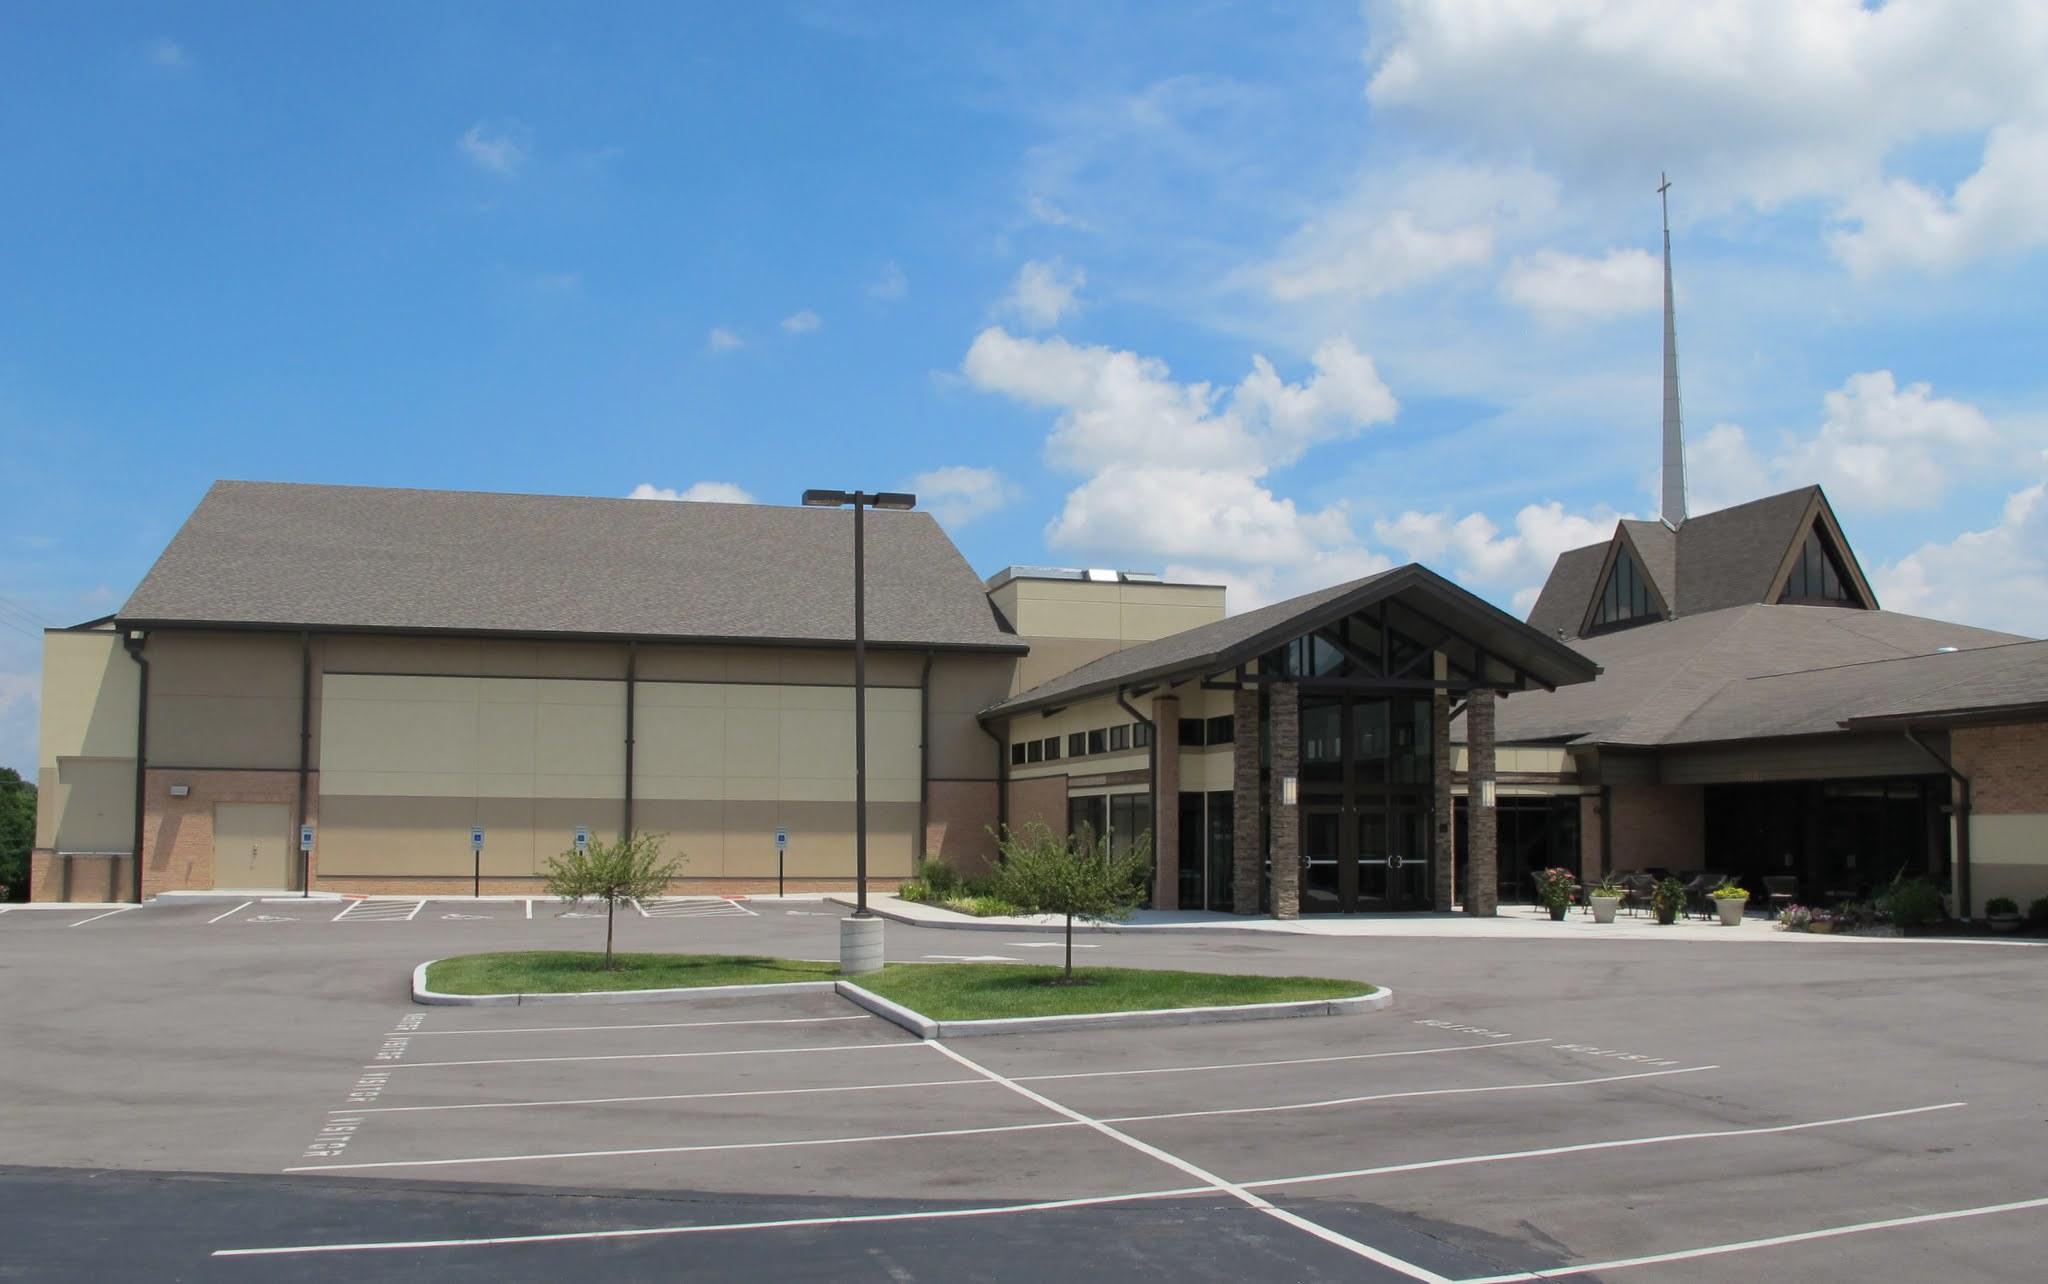 grace community chapel church addition.JPG